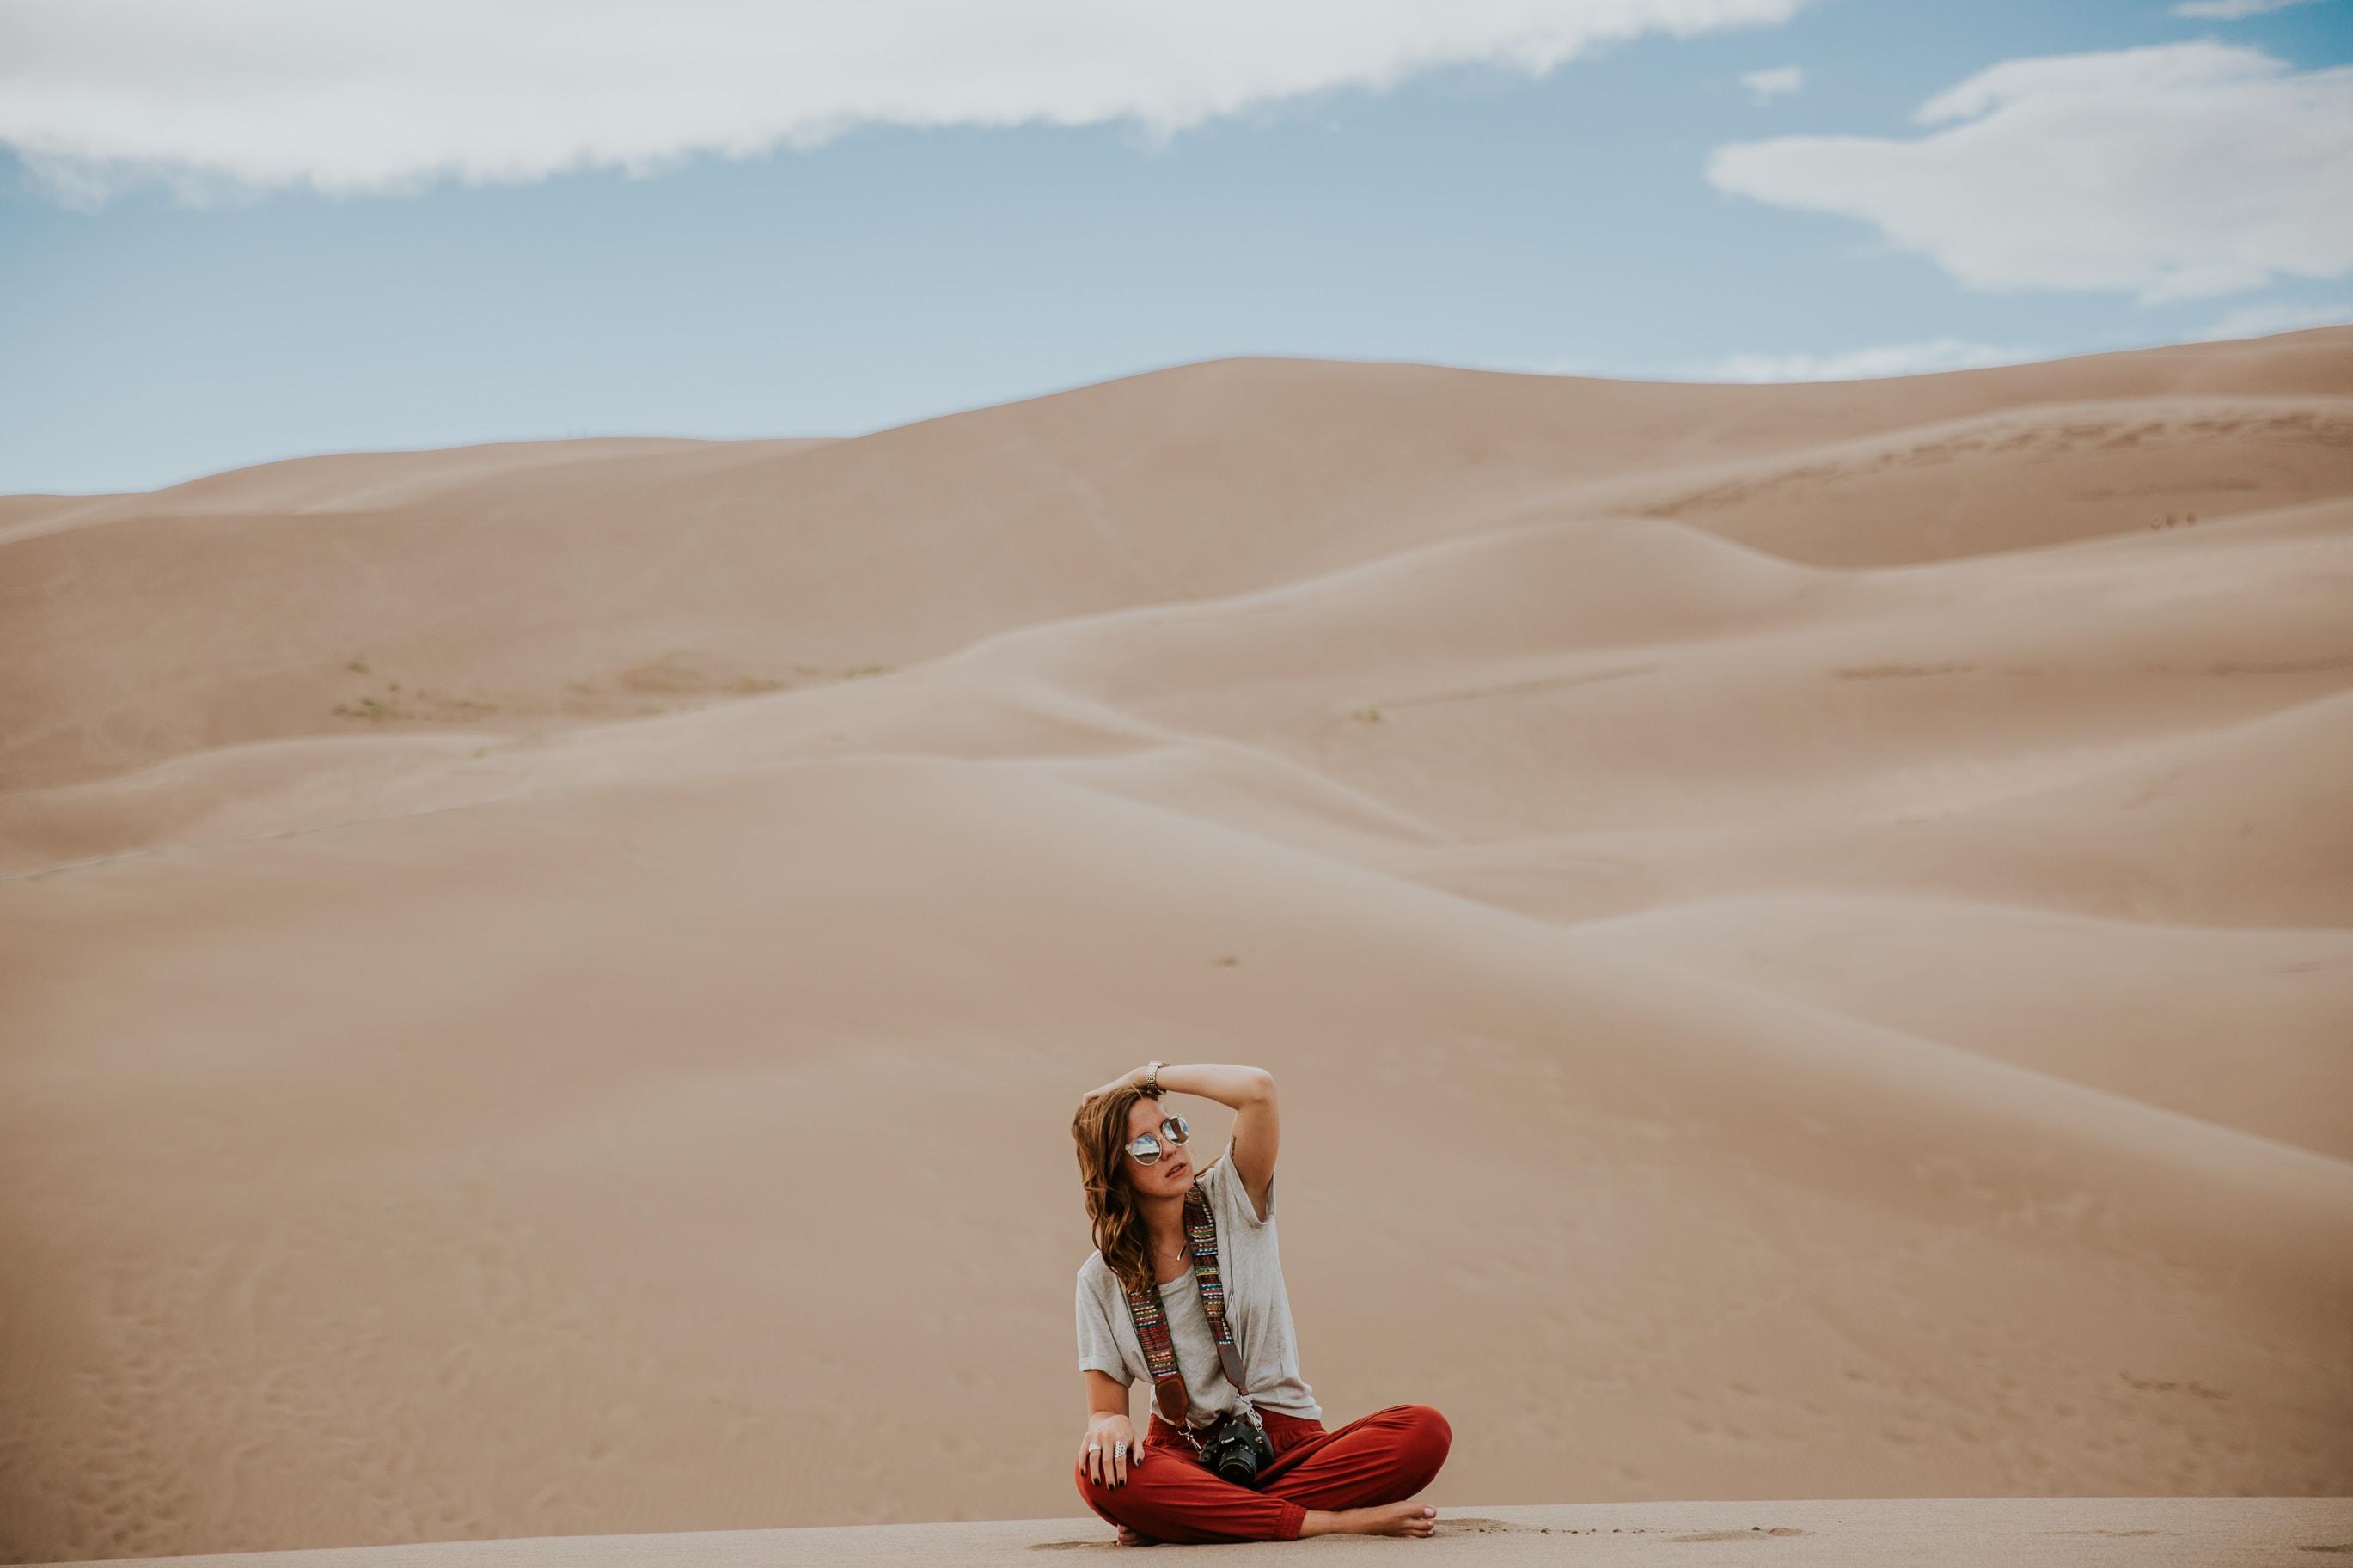 minimalist photography of woman sitting on desert ground